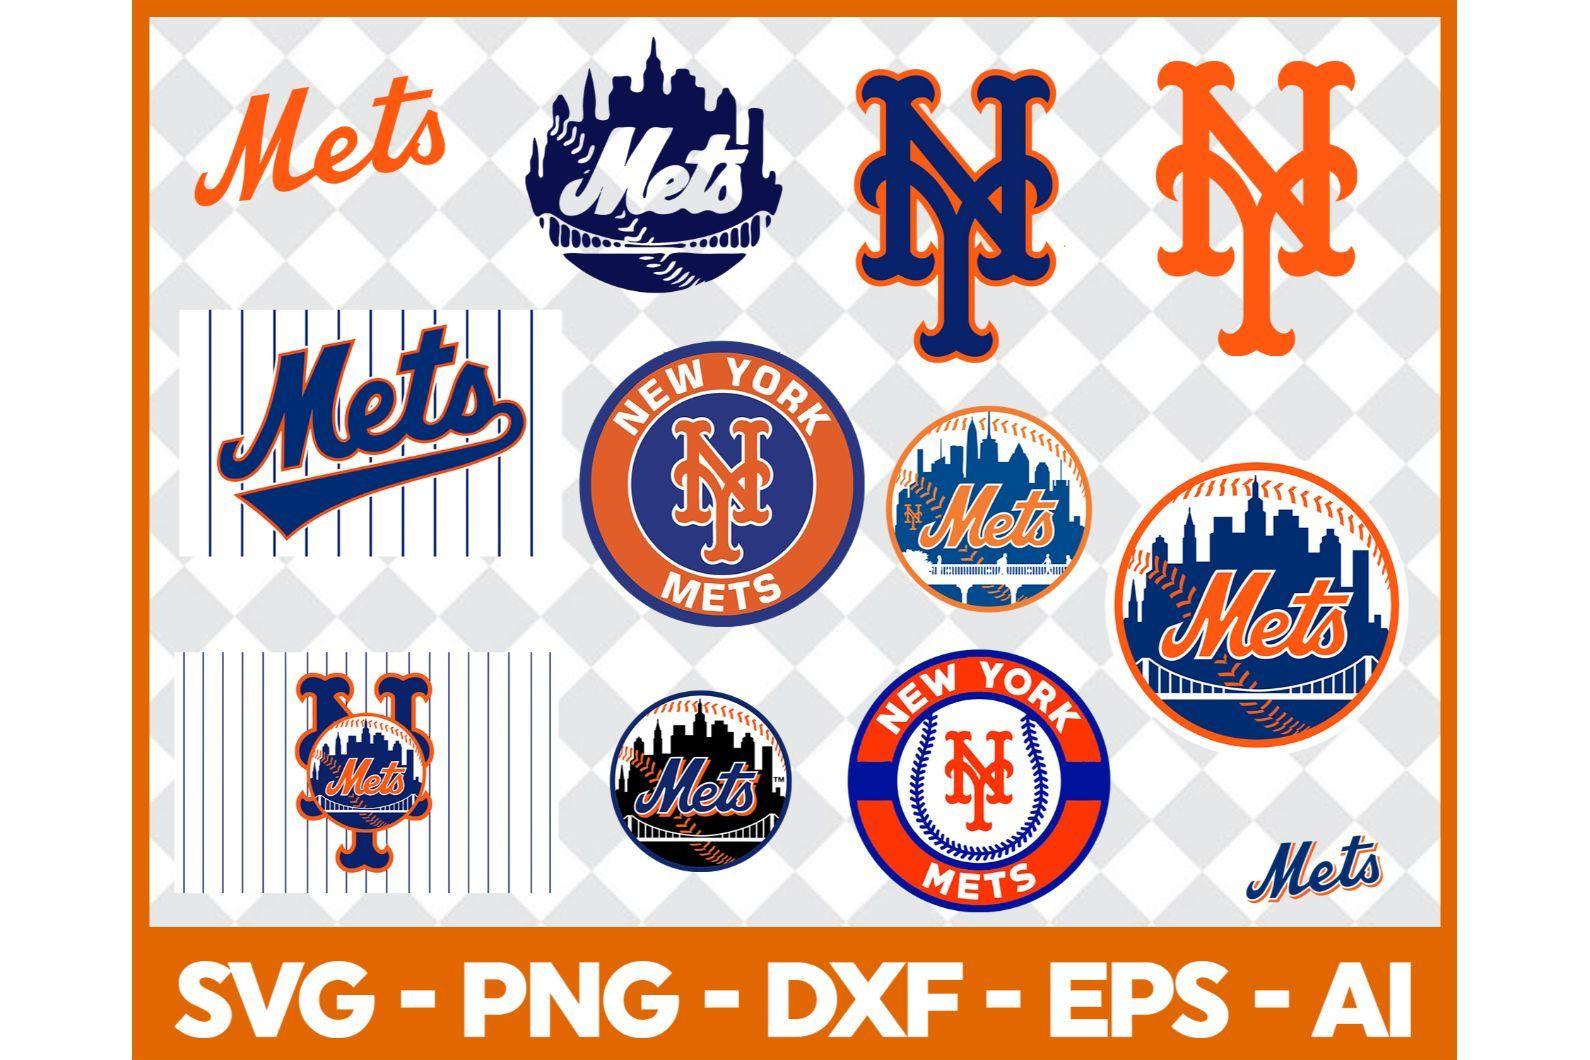 New York Mets Mlb Svg Baseball Svg File Baseball Logo Mlb Fabric Mlb Baseball Mlb Svg Baseball New Y In 2020 New York Mets Baseball Svg Mets